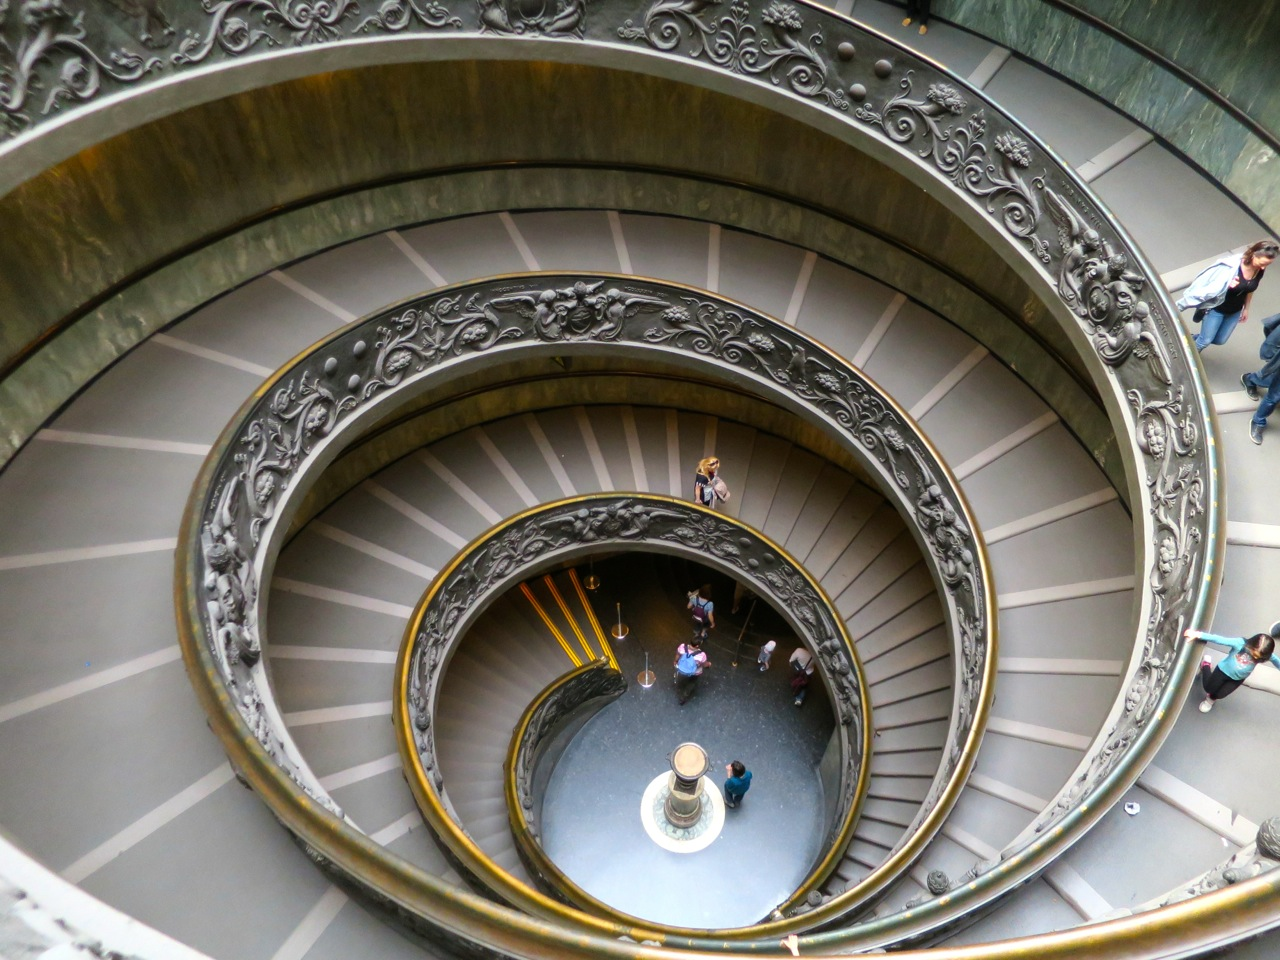 Vaticano 1 23